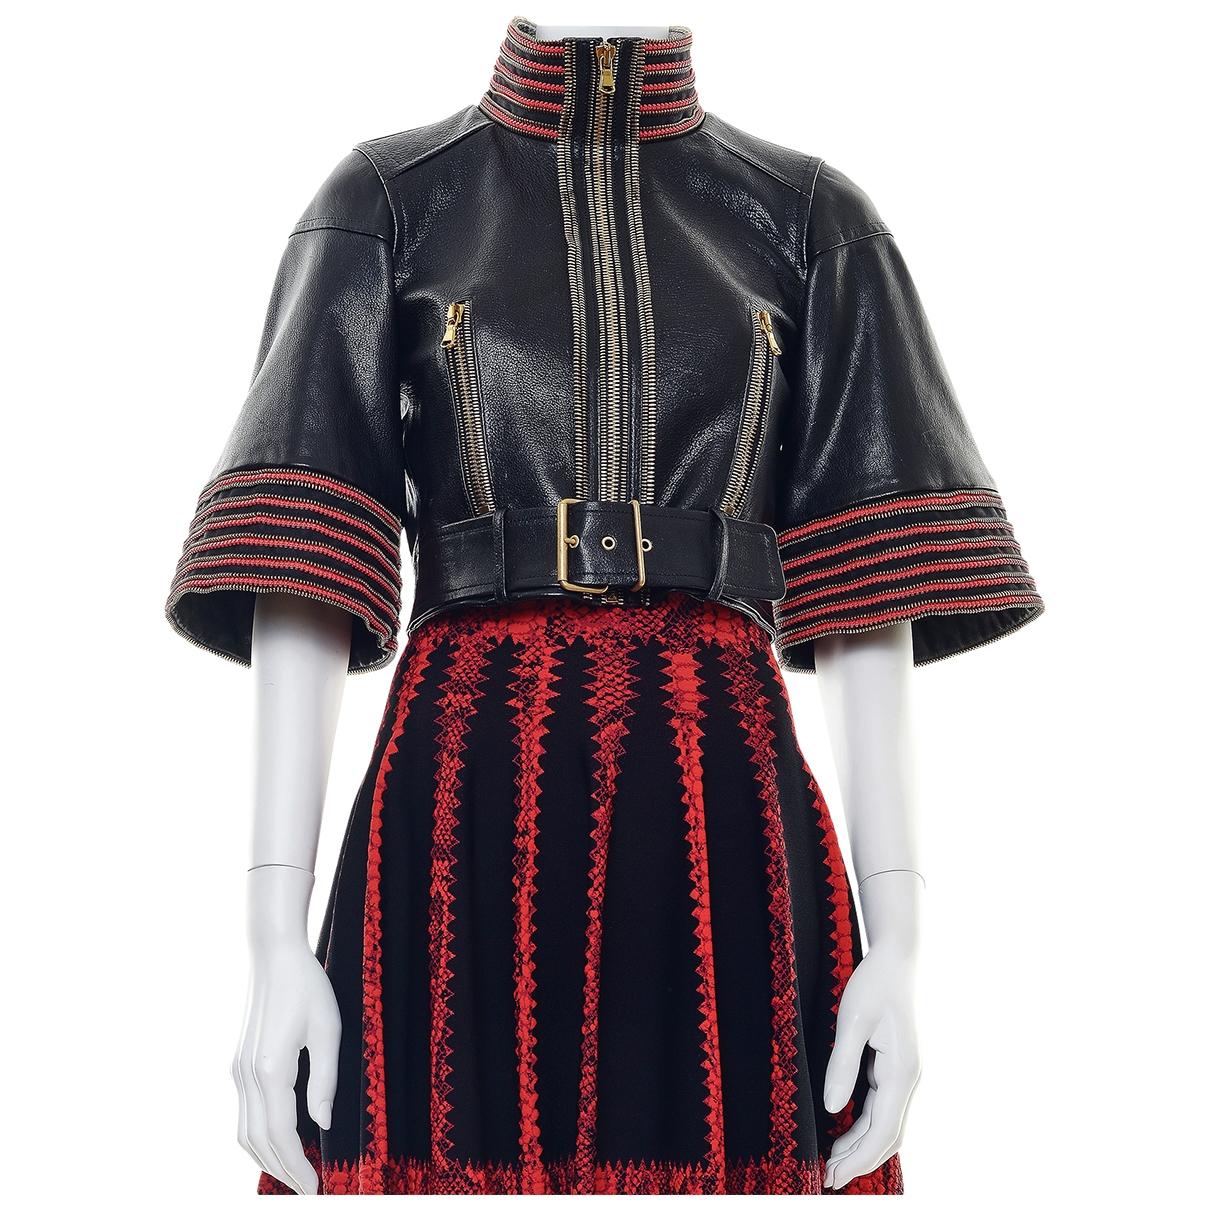 Alexander Mcqueen \N Black Leather jacket for Women M International